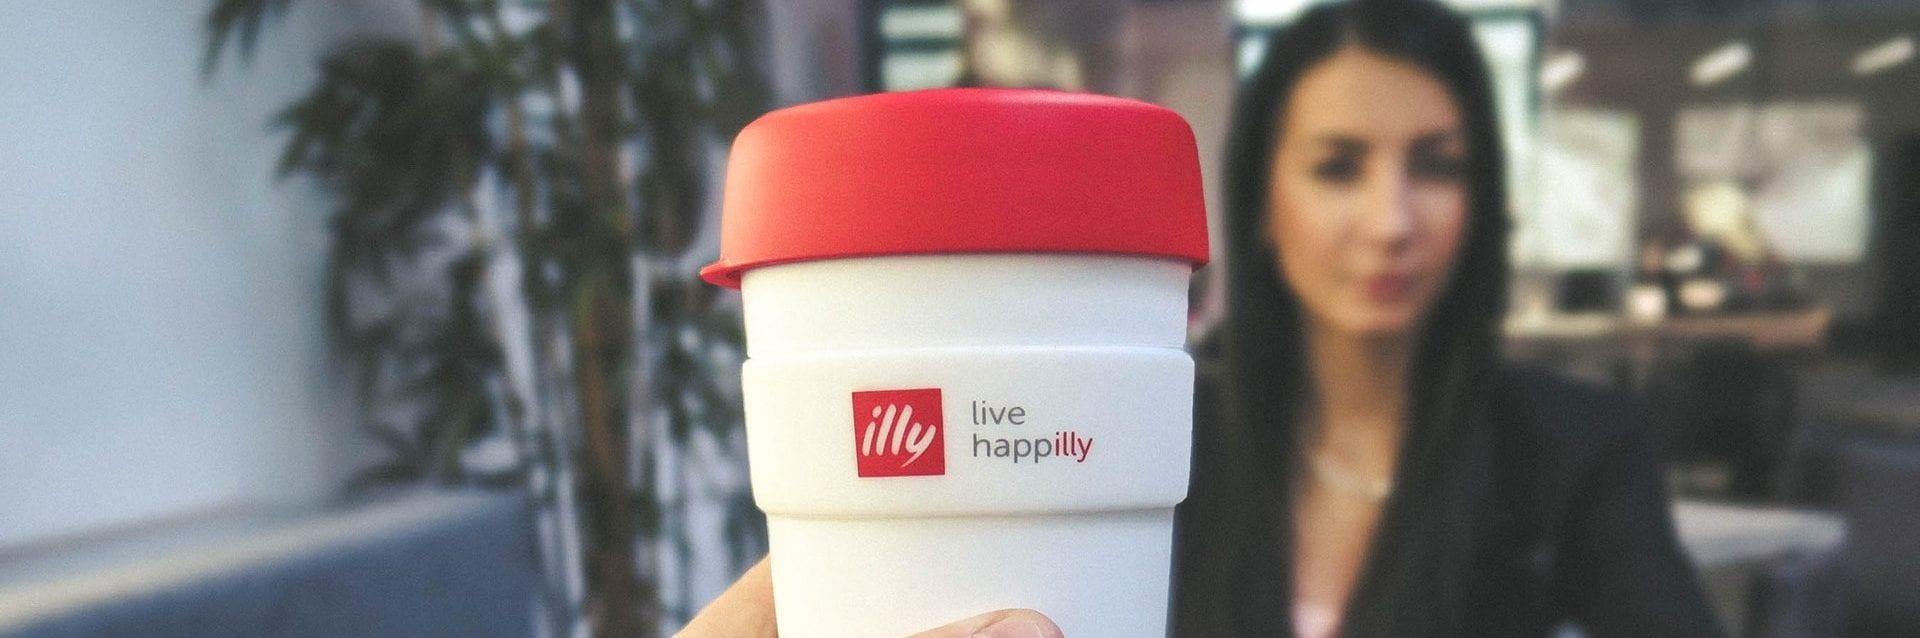 Branding | Εταιρική Ταυτότητα